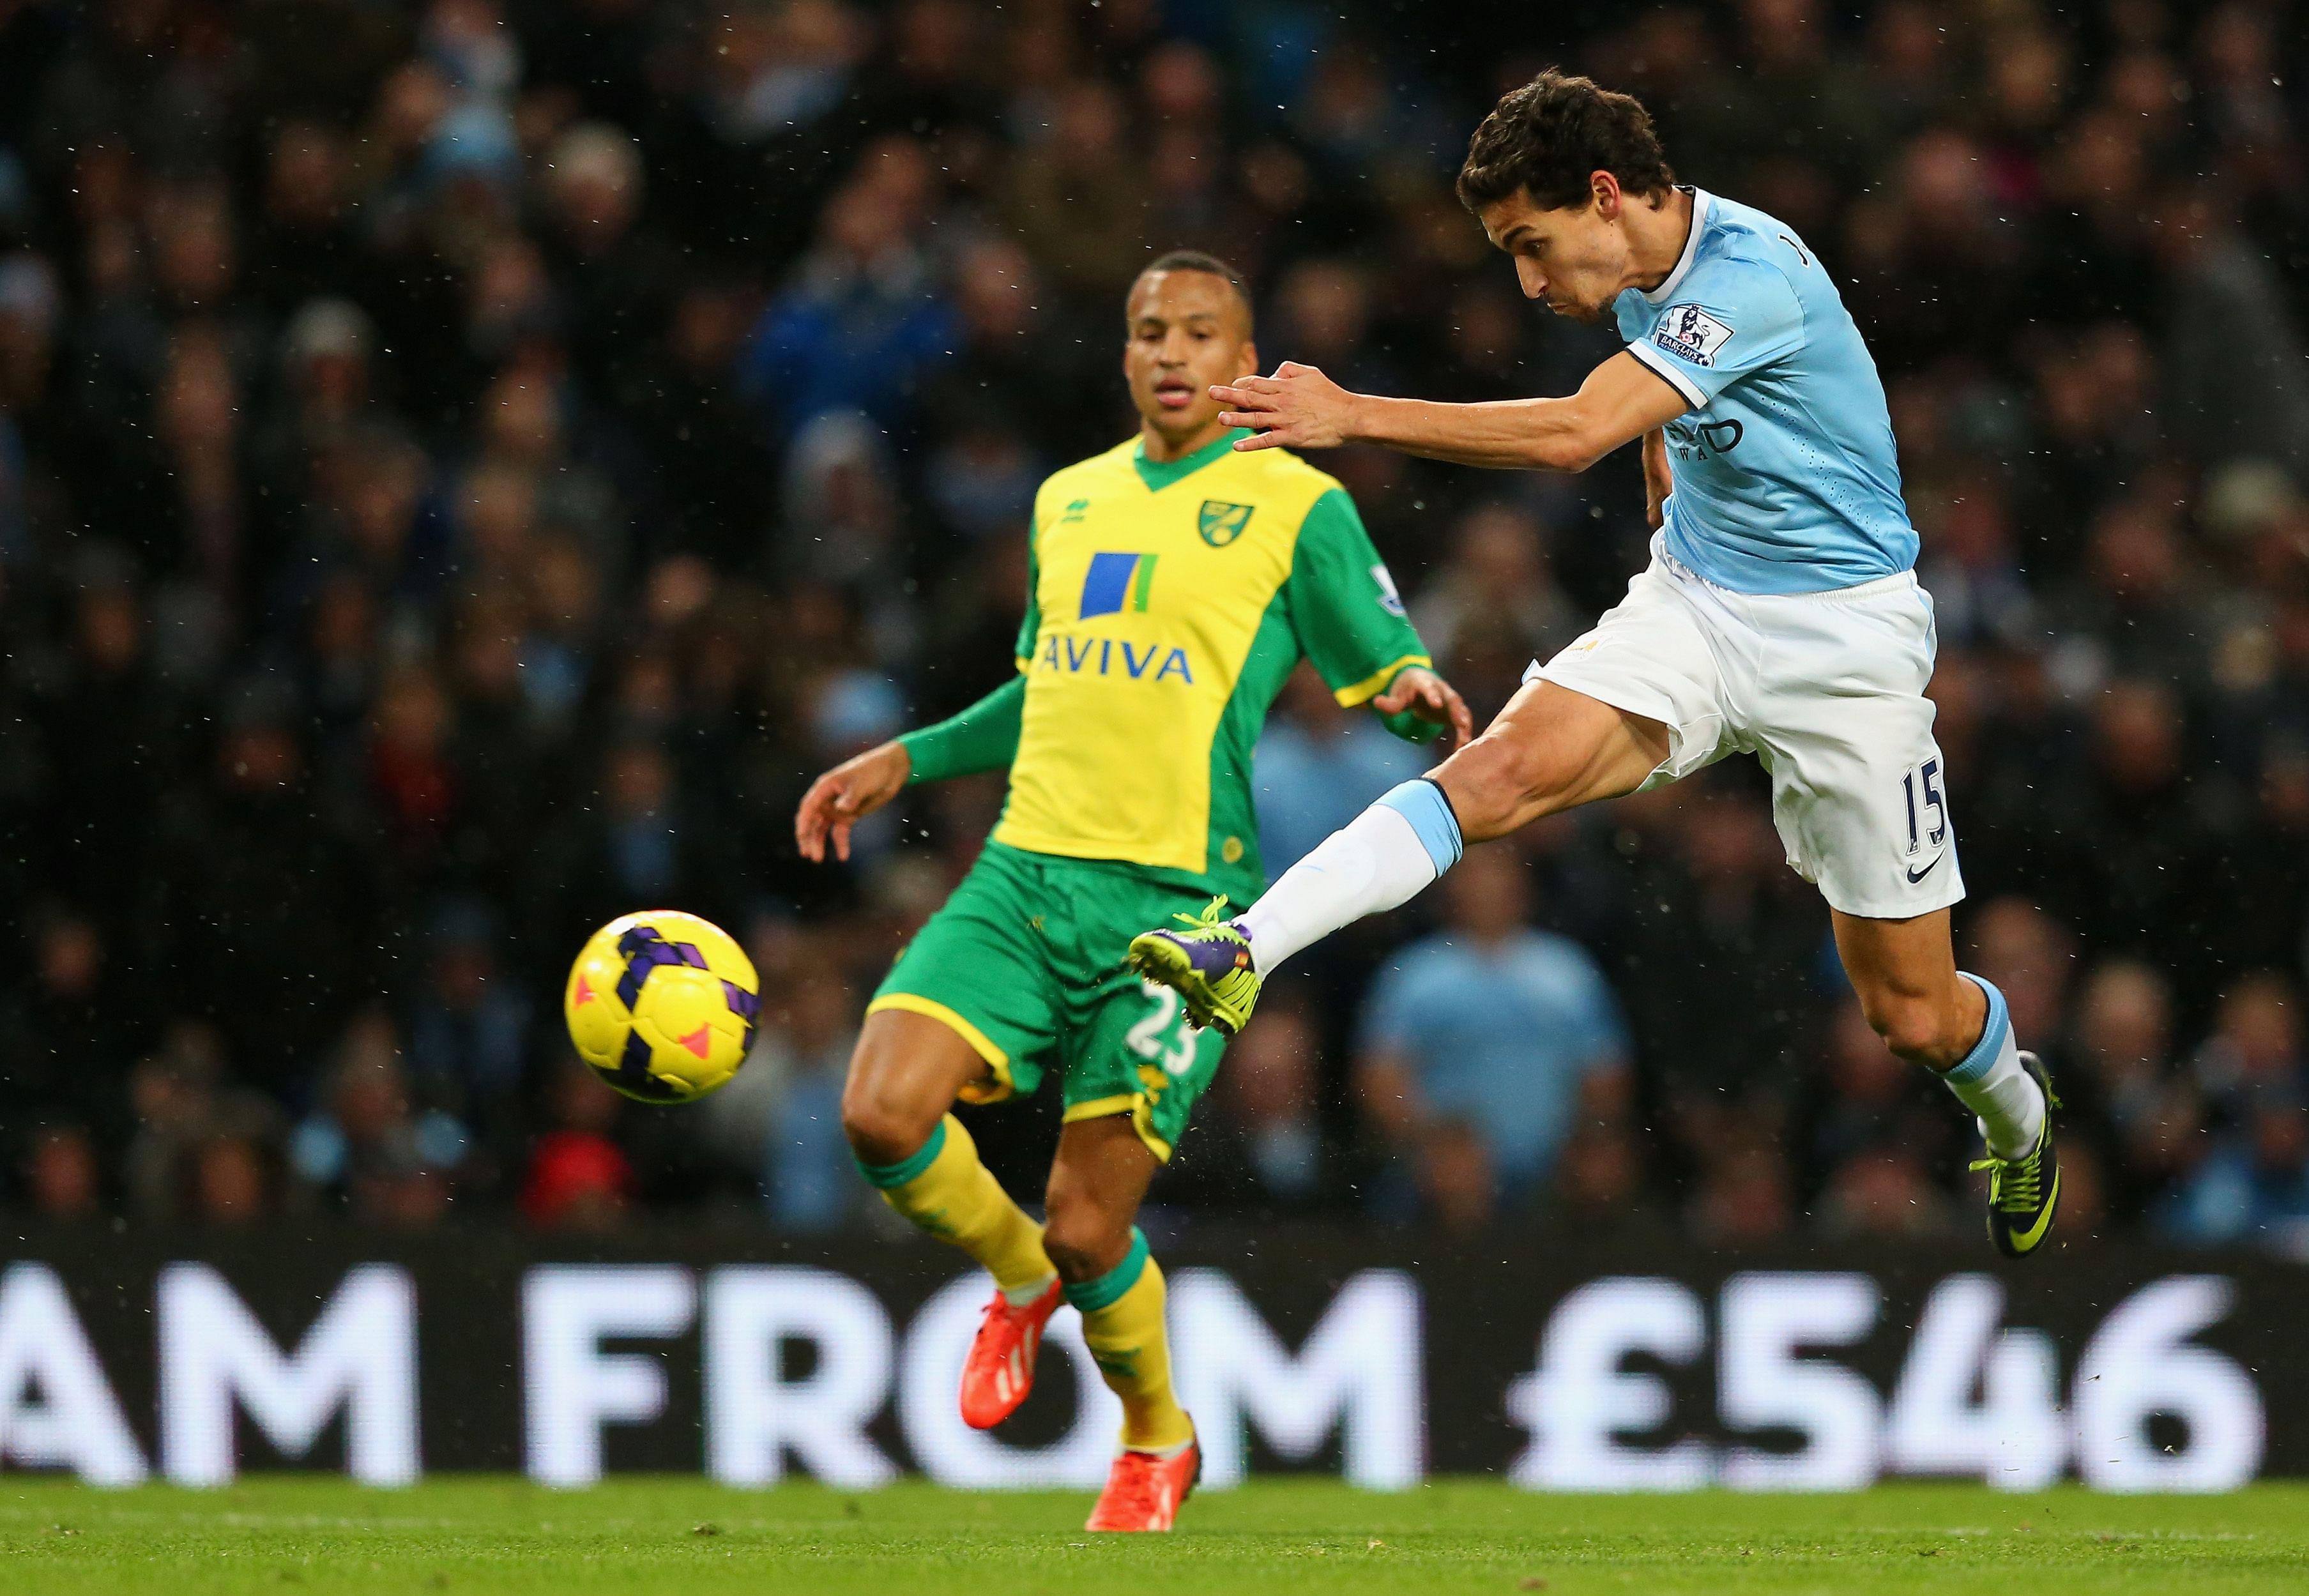 Five Talking Points from Premier League Gameweek 10